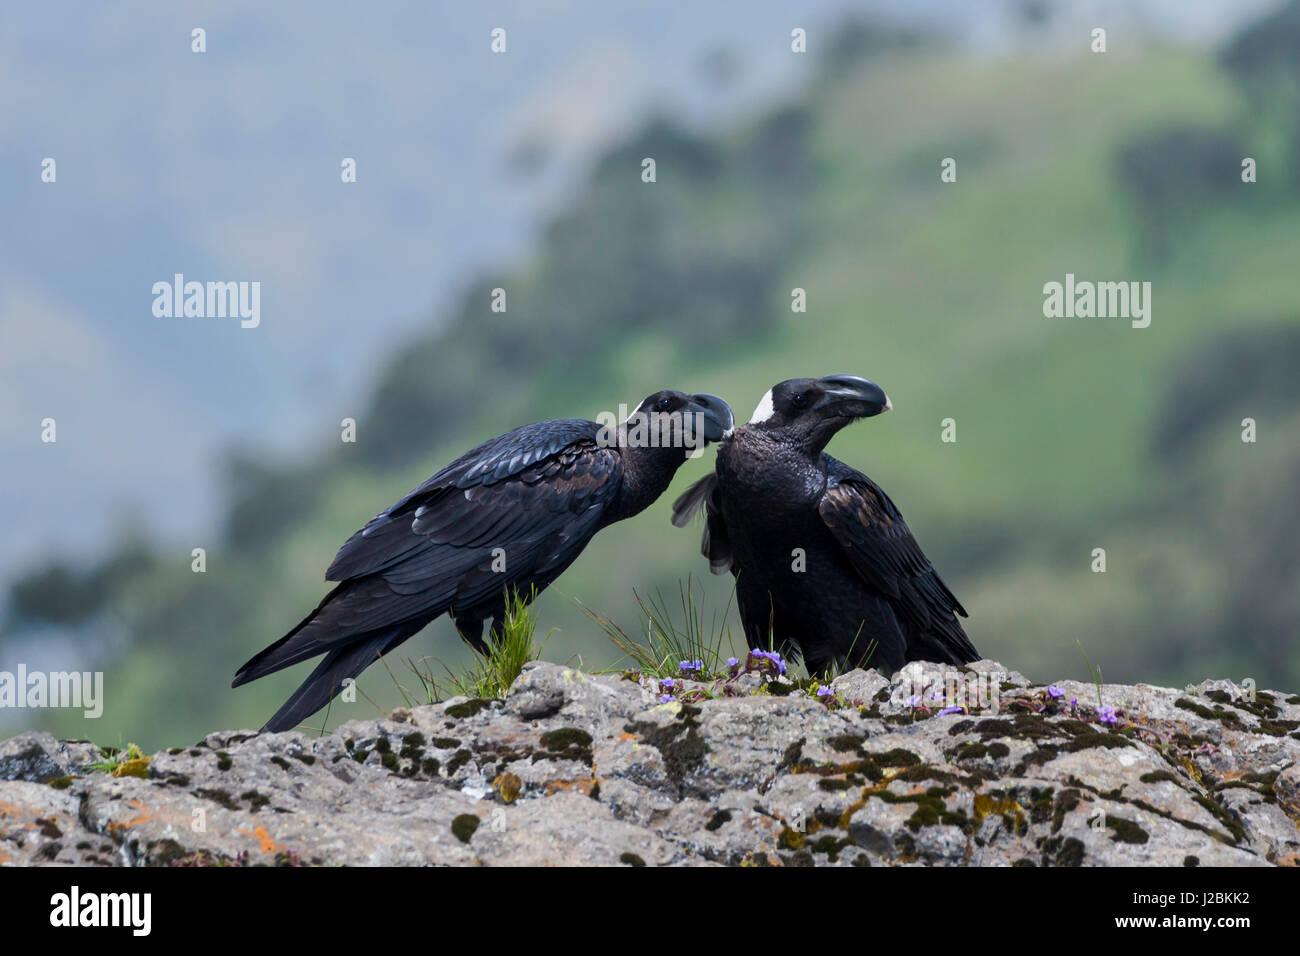 Africa, Ethiopian Highlands, Western Amhara, Simien Mountains National Park, Thick-billed ravens, (Corvus crassirostris). - Stock Image